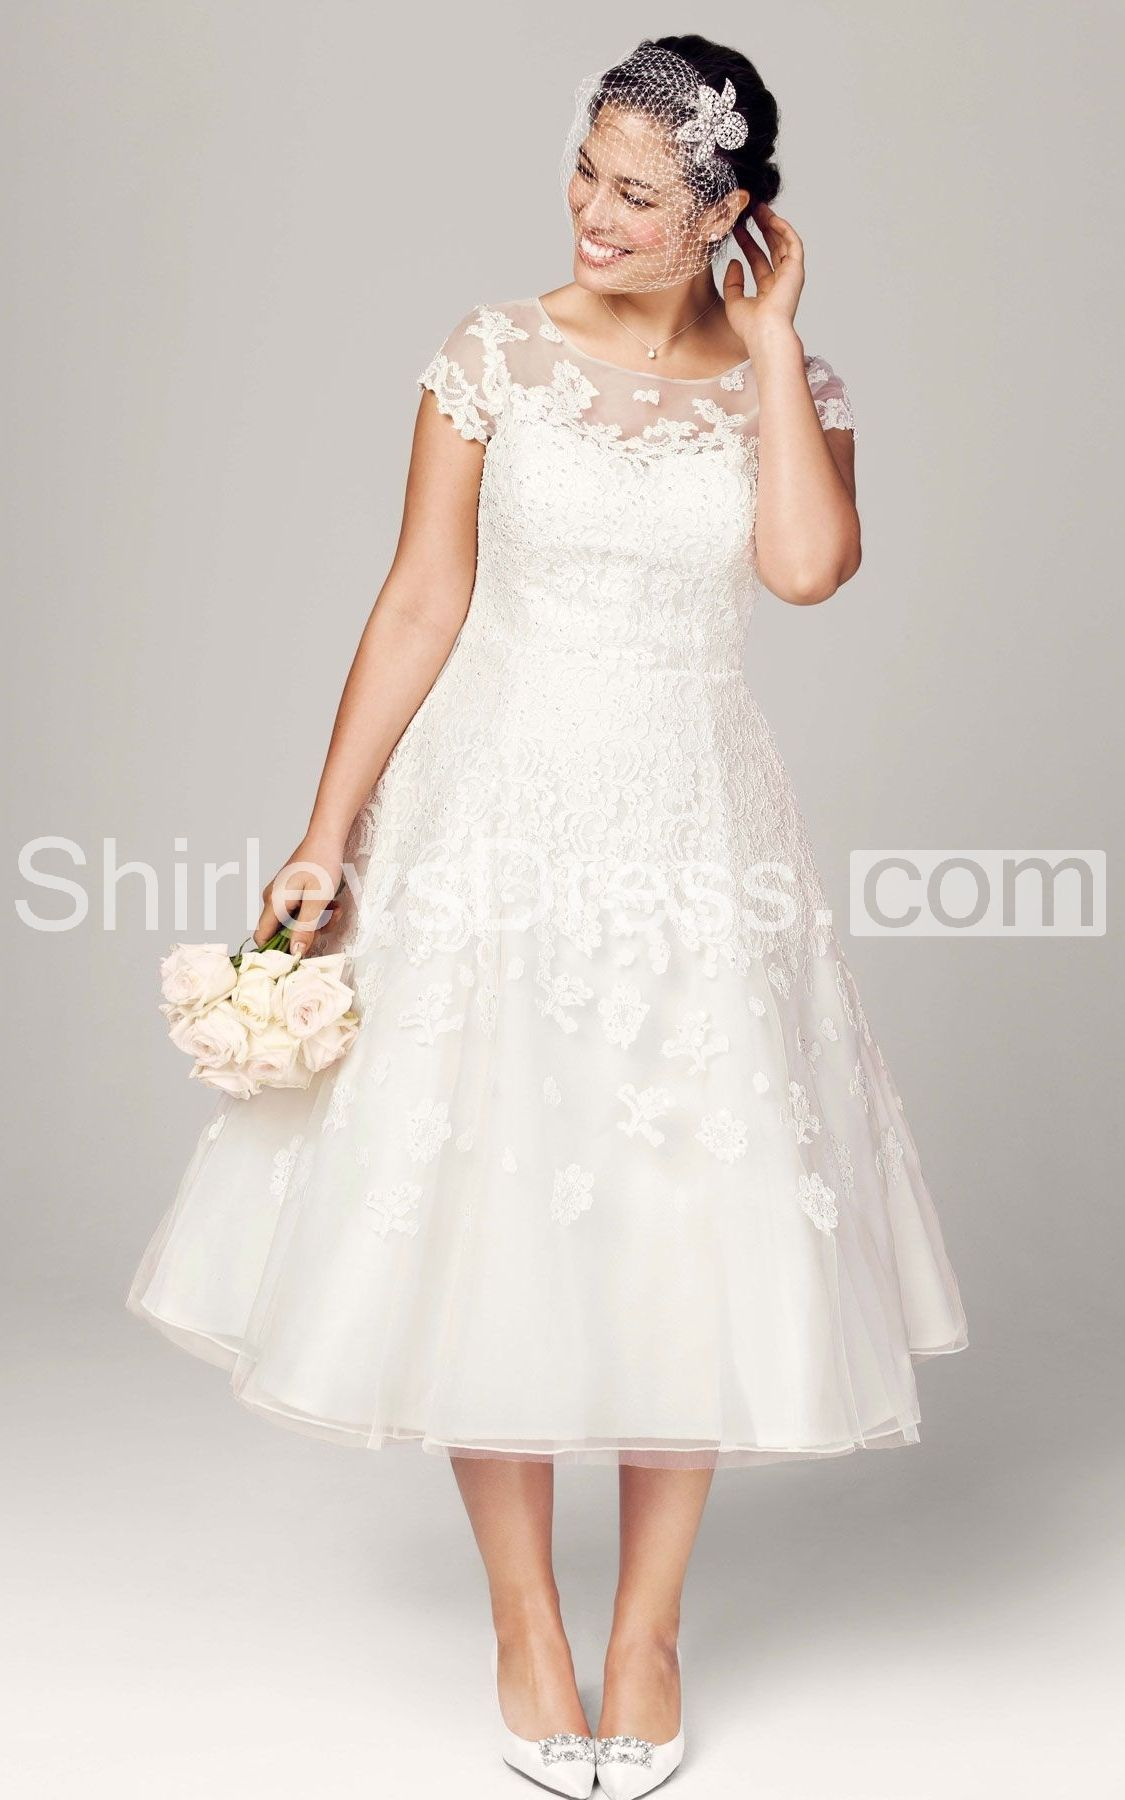 162 99 Tea Length Plus Size Wedding Dress With Cap Sleeve Illusion Nec Plus Size Wedding Dresses With Sleeves Wedding Dress Cap Sleeves Short Wedding Dress [ 1800 x 1125 Pixel ]